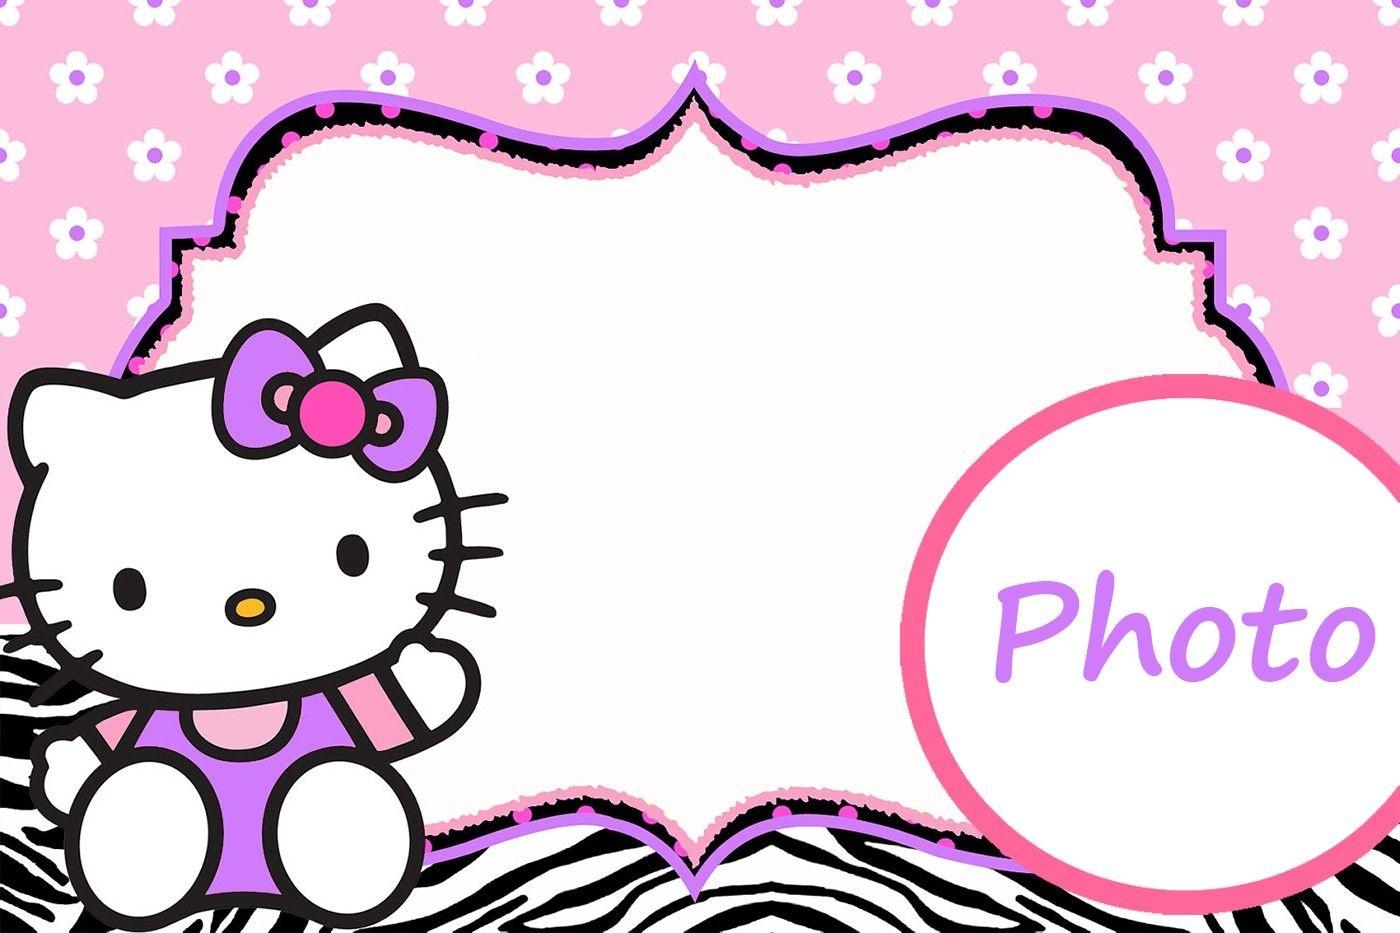 Personalized Hello Kitty Invitation Template | Hello Kitty | Hello - Free Printable Hello Kitty Pictures